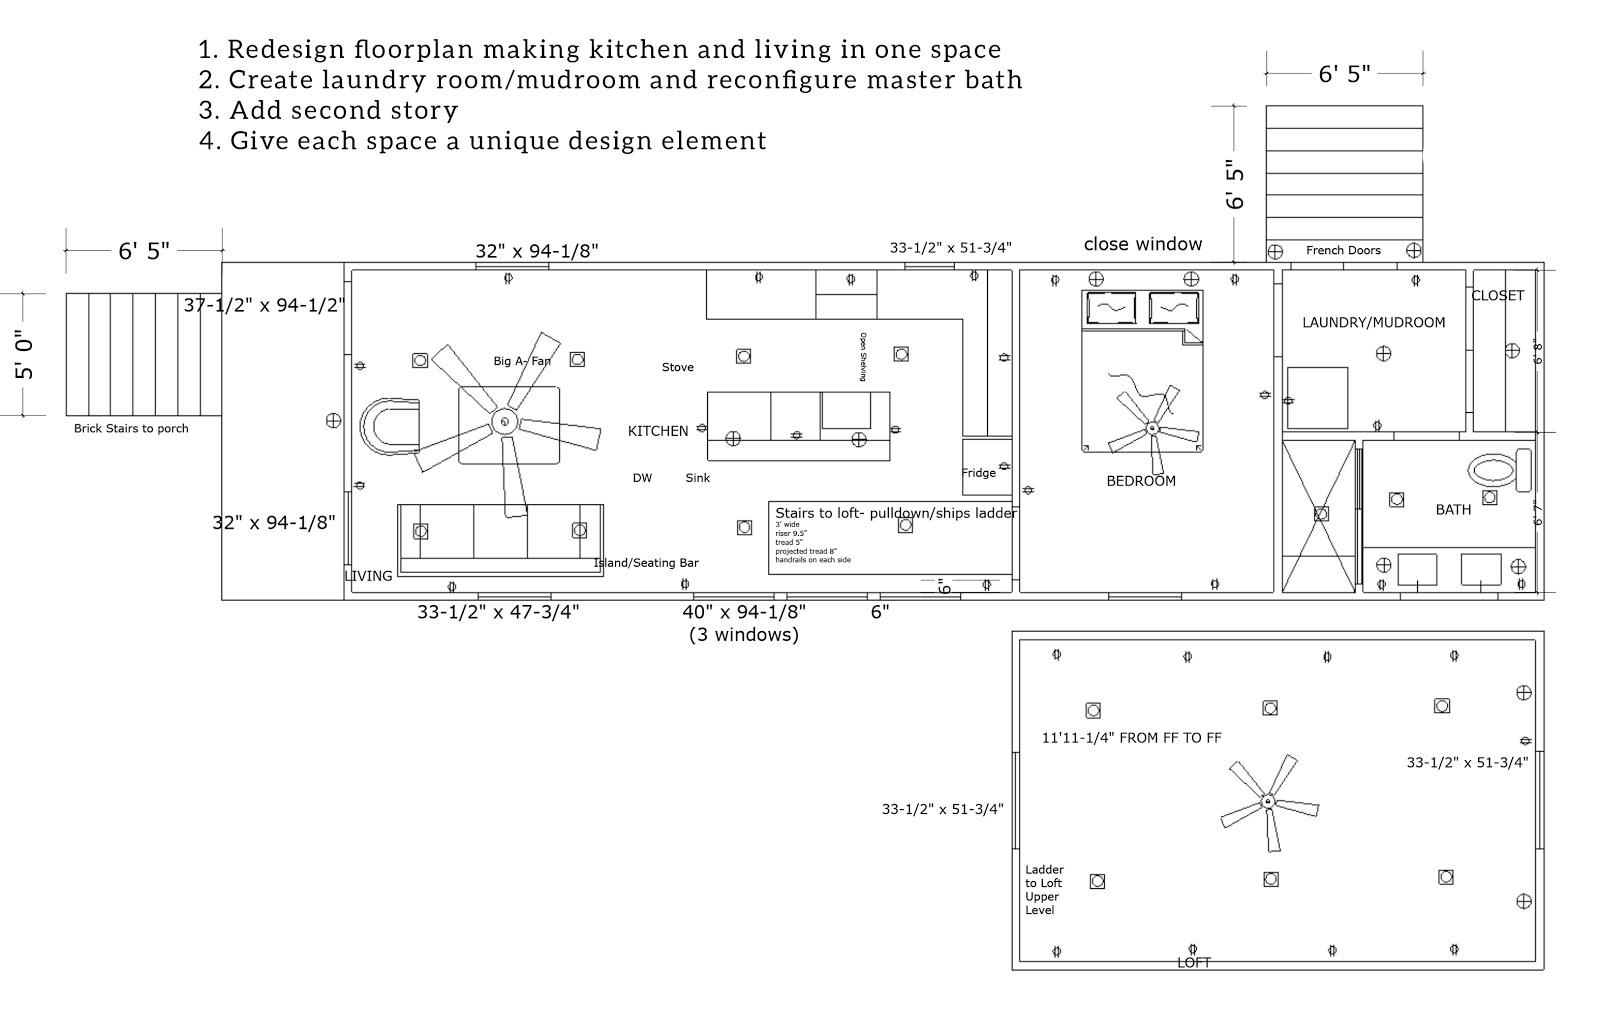 minimalist homes | minimalist thoughts | livemnml: magnolia homes